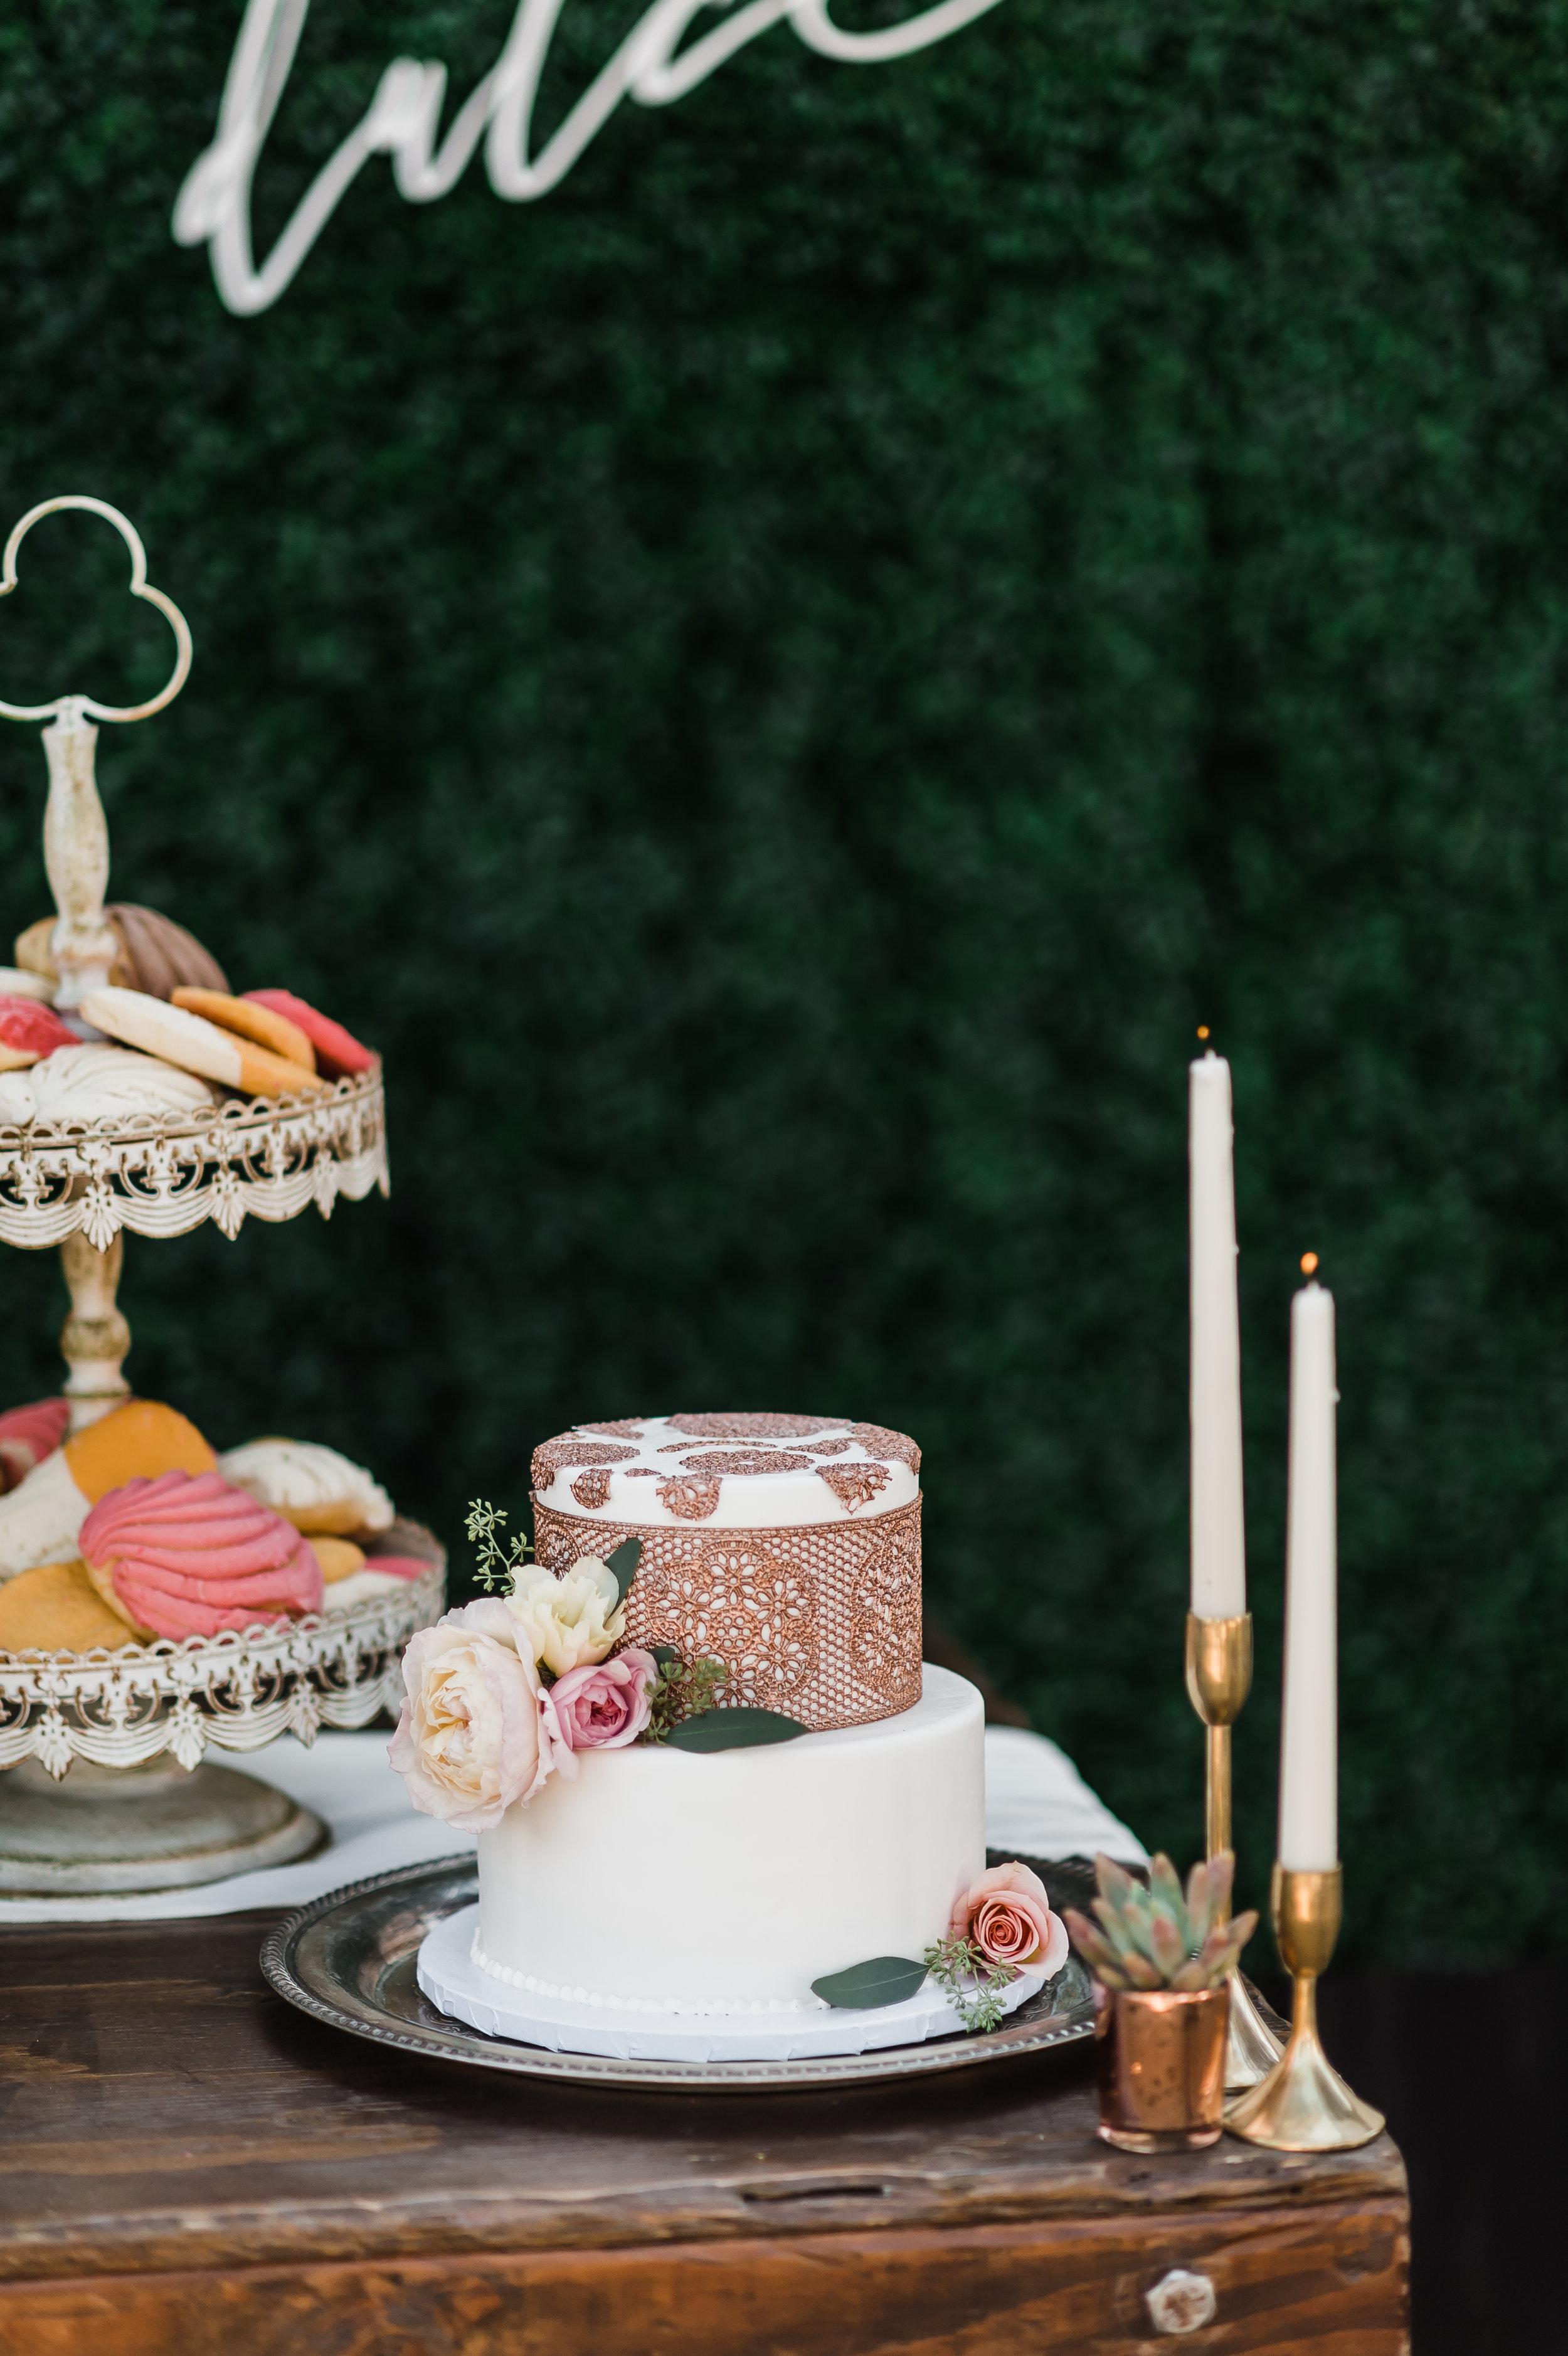 www.santabarbarawedding.com | Michelle Ramirez Photography | Olivas Adobe | Karen Marie Events | Tangled Lotus | Sweet D's Cakes | Wedding Cake